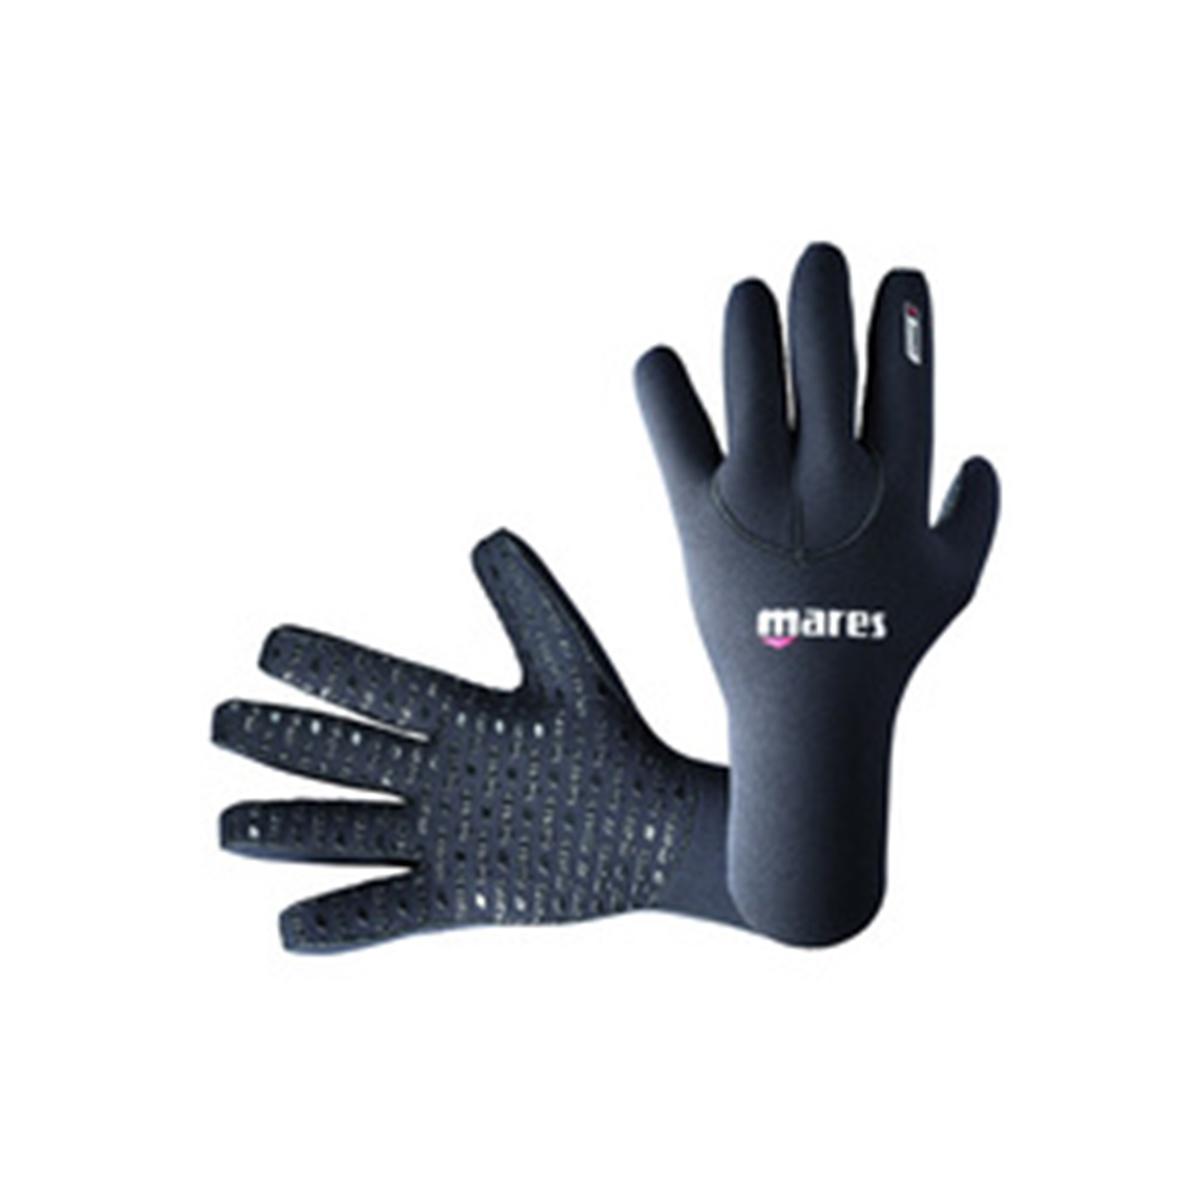 Guanto flexa classic 3mm